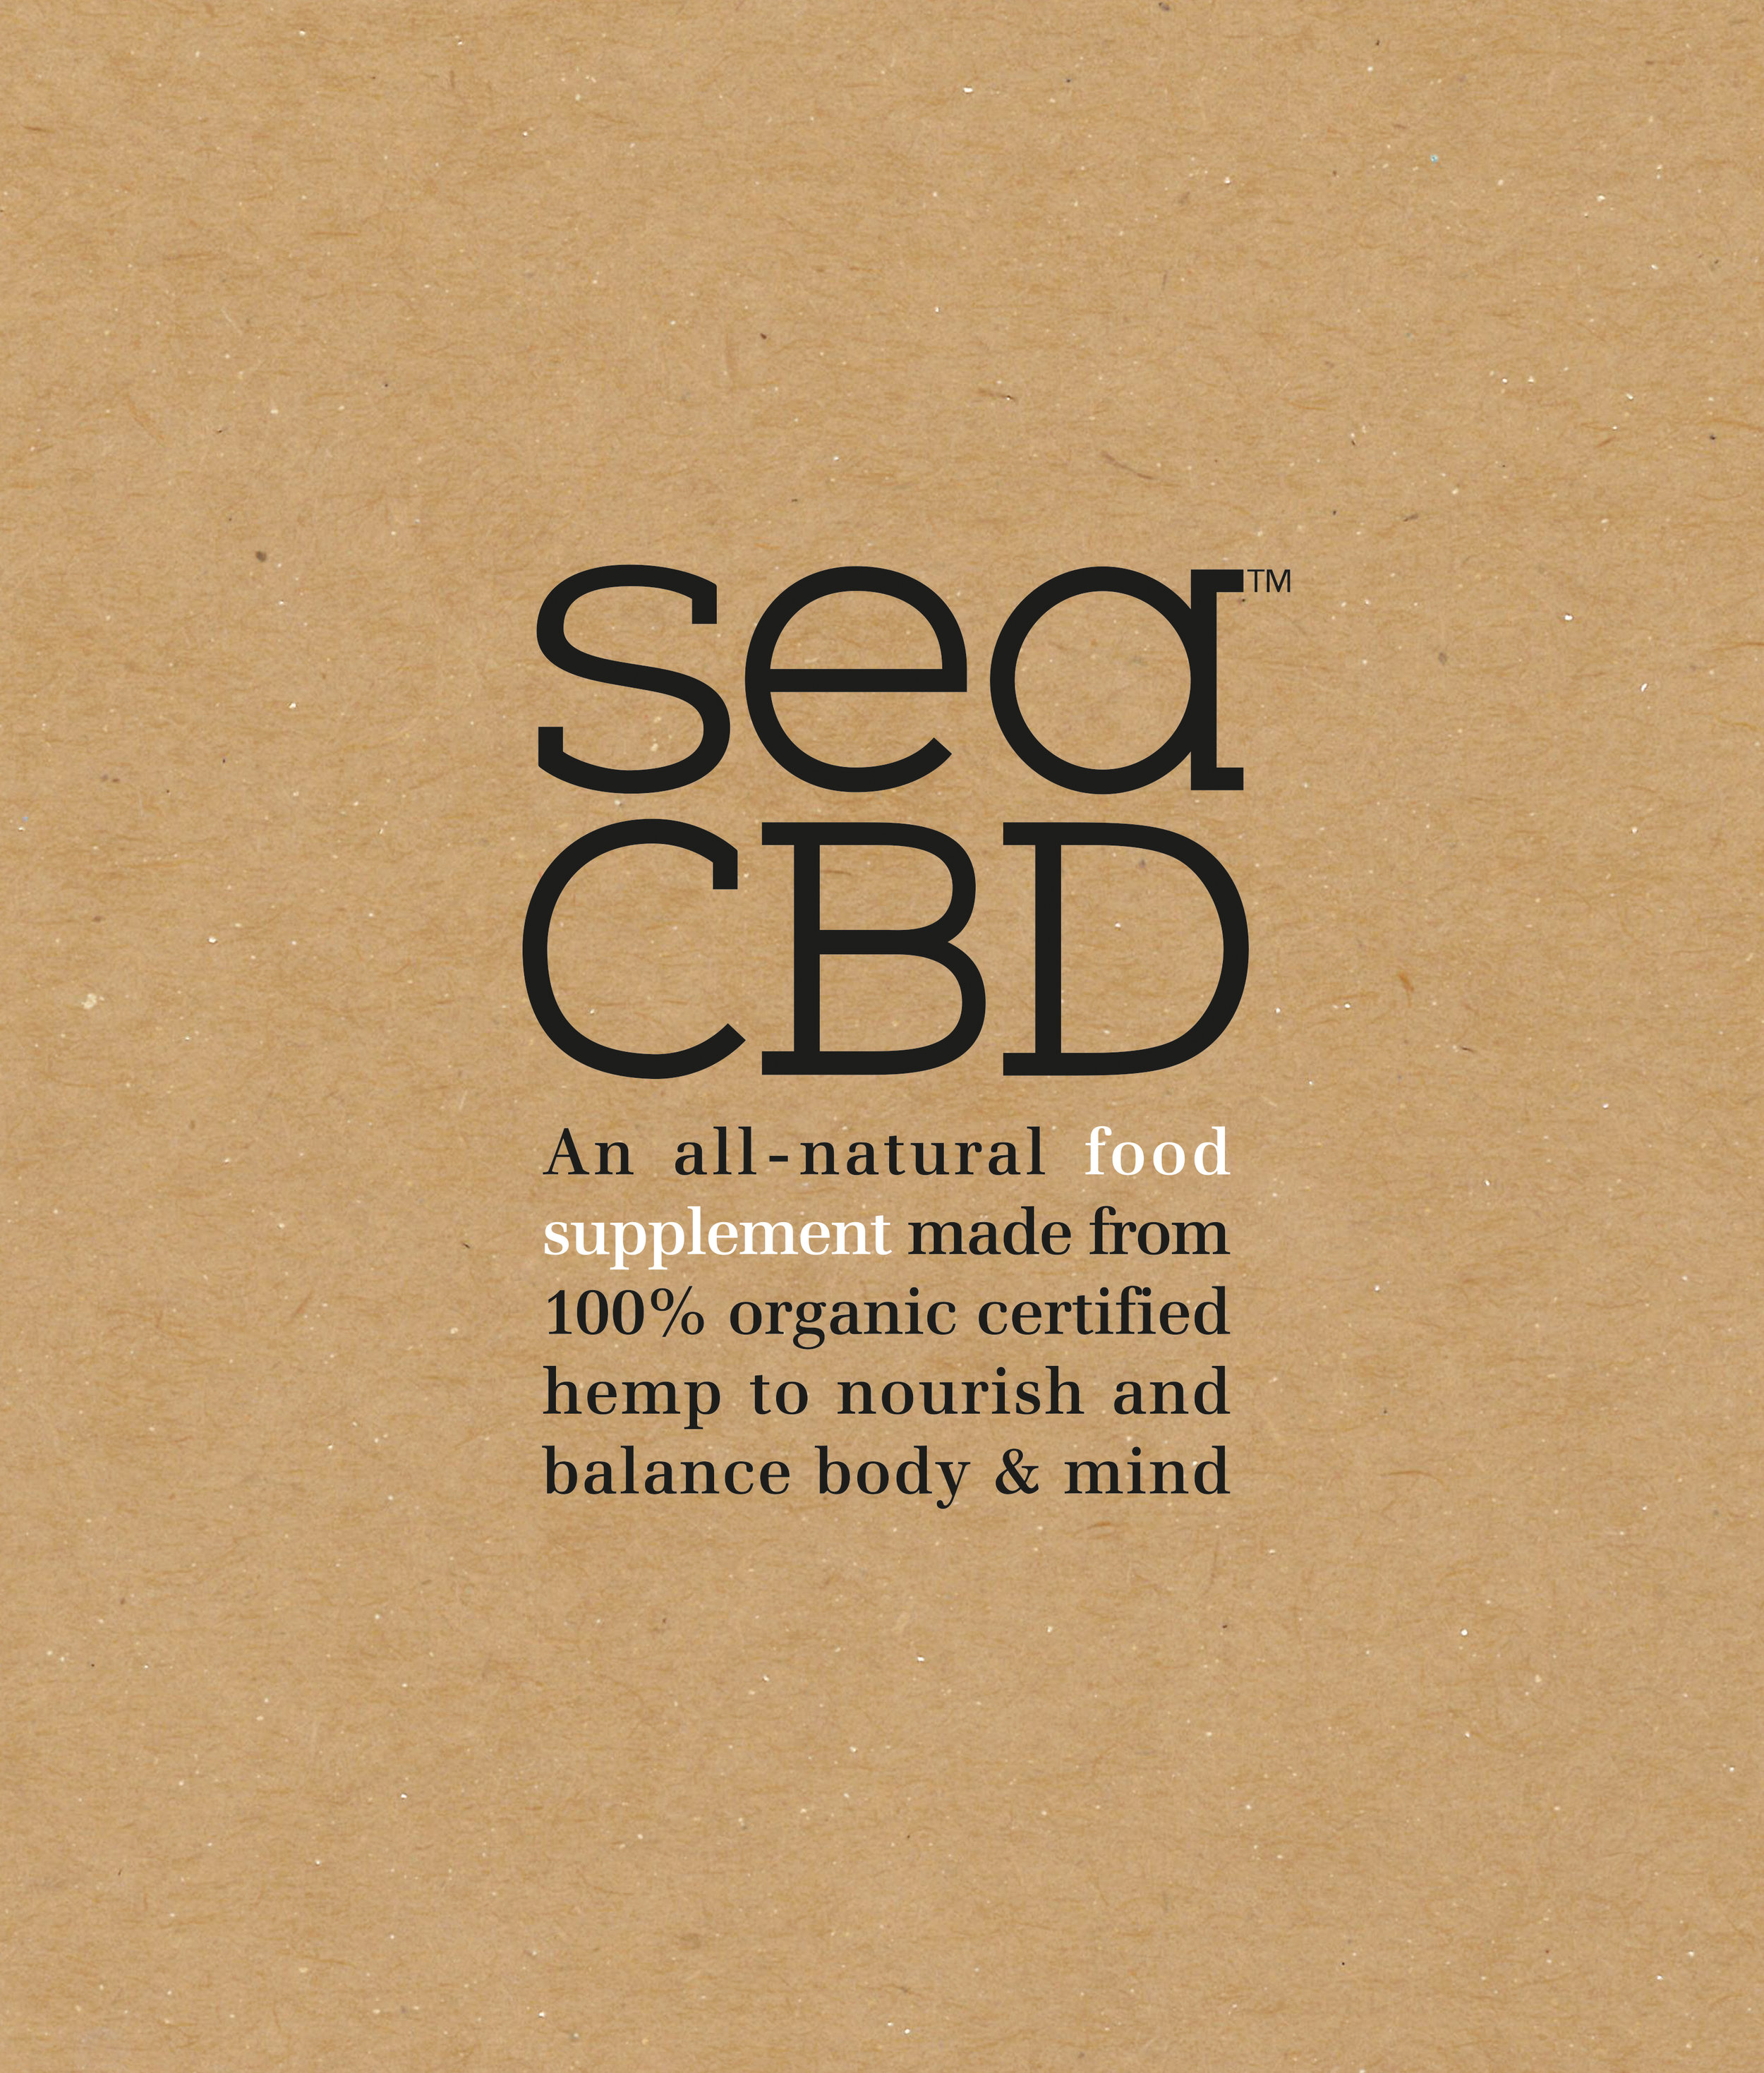 Sea-CBD Brandmark.jpg